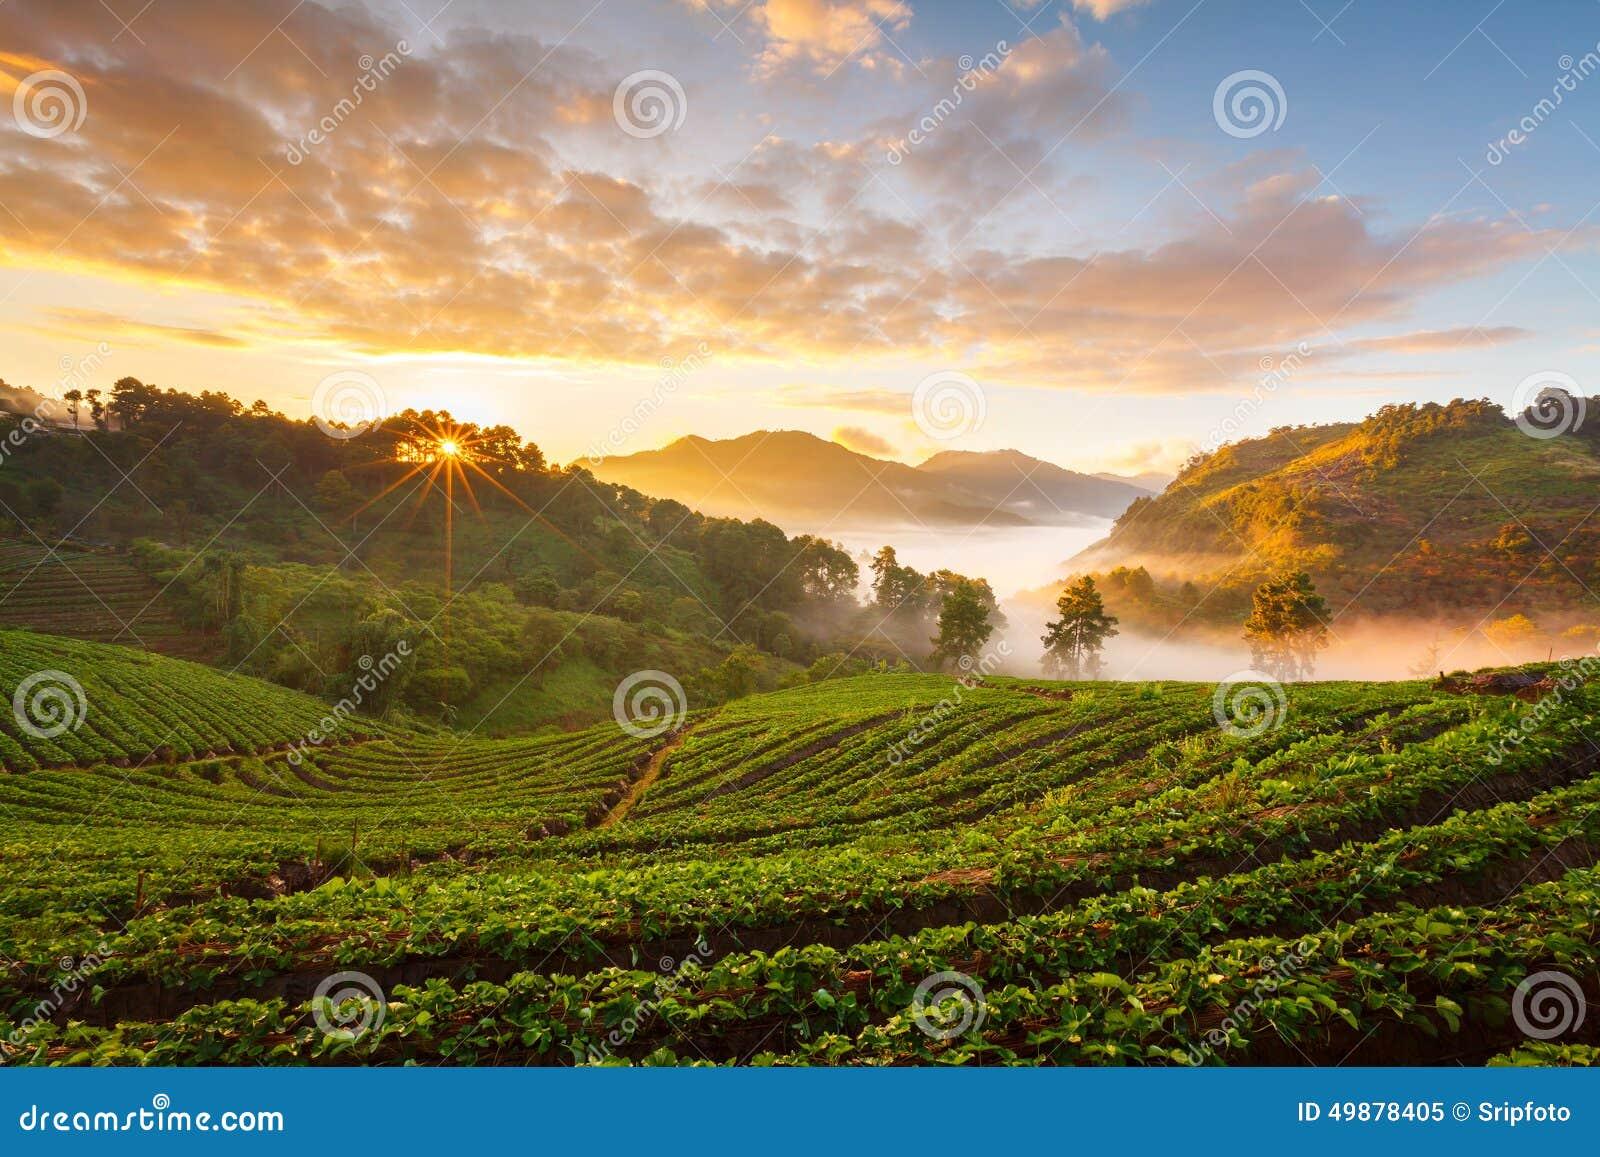 Misty morning sunrise in strawberry garden at Doi Angk-hang mountain, chiangmai : thailand.